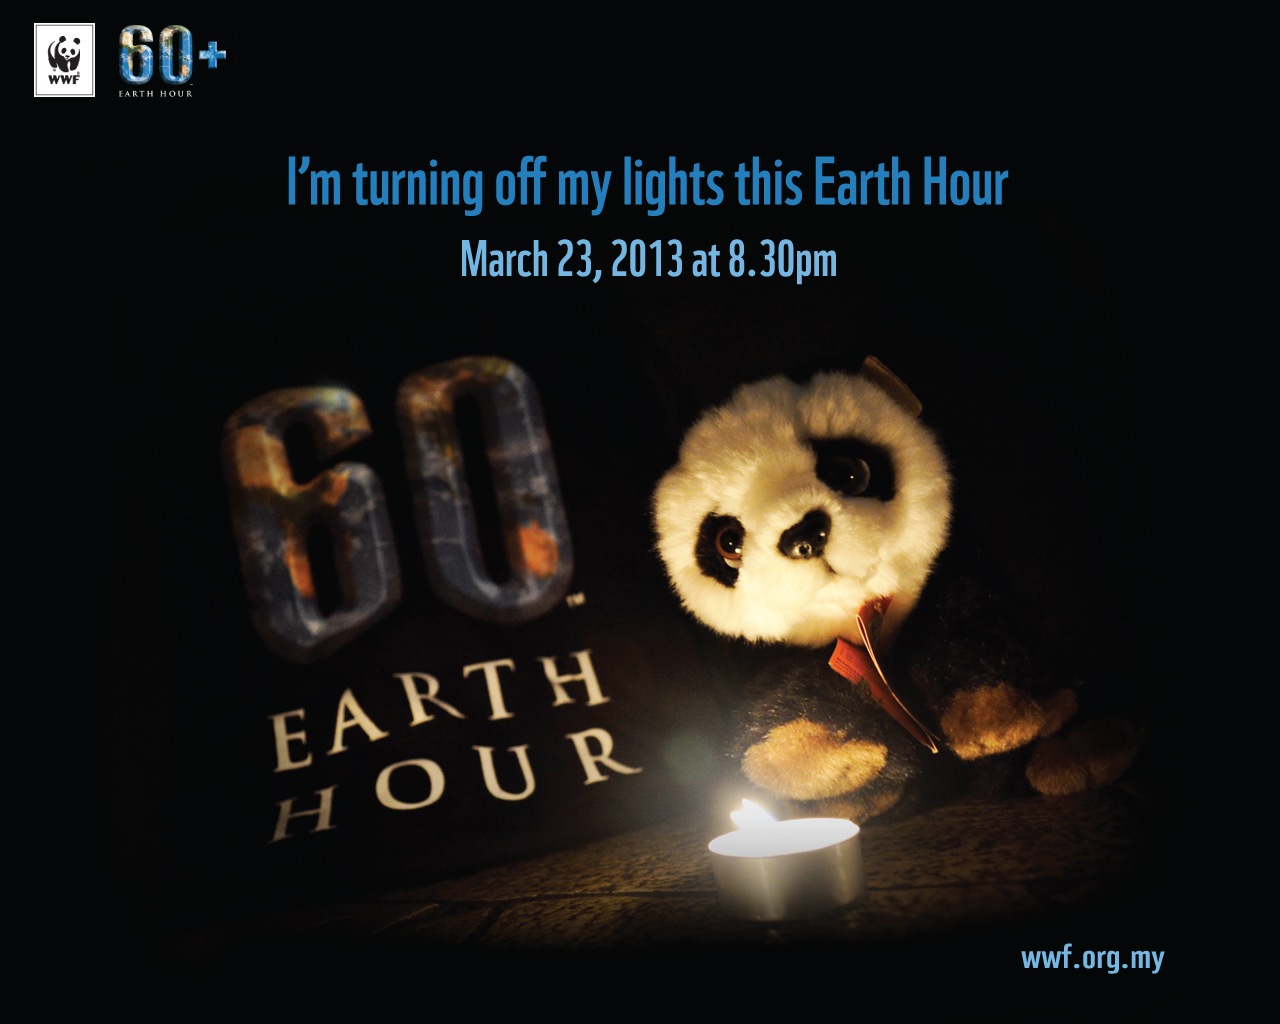 http://3.bp.blogspot.com/-jTxytrw5ldI/USipeWqY8GI/AAAAAAAAAoo/FvbEZ8WwzpI/s1600/1280x1024__earth_hour_2013_wallpaper.jpg